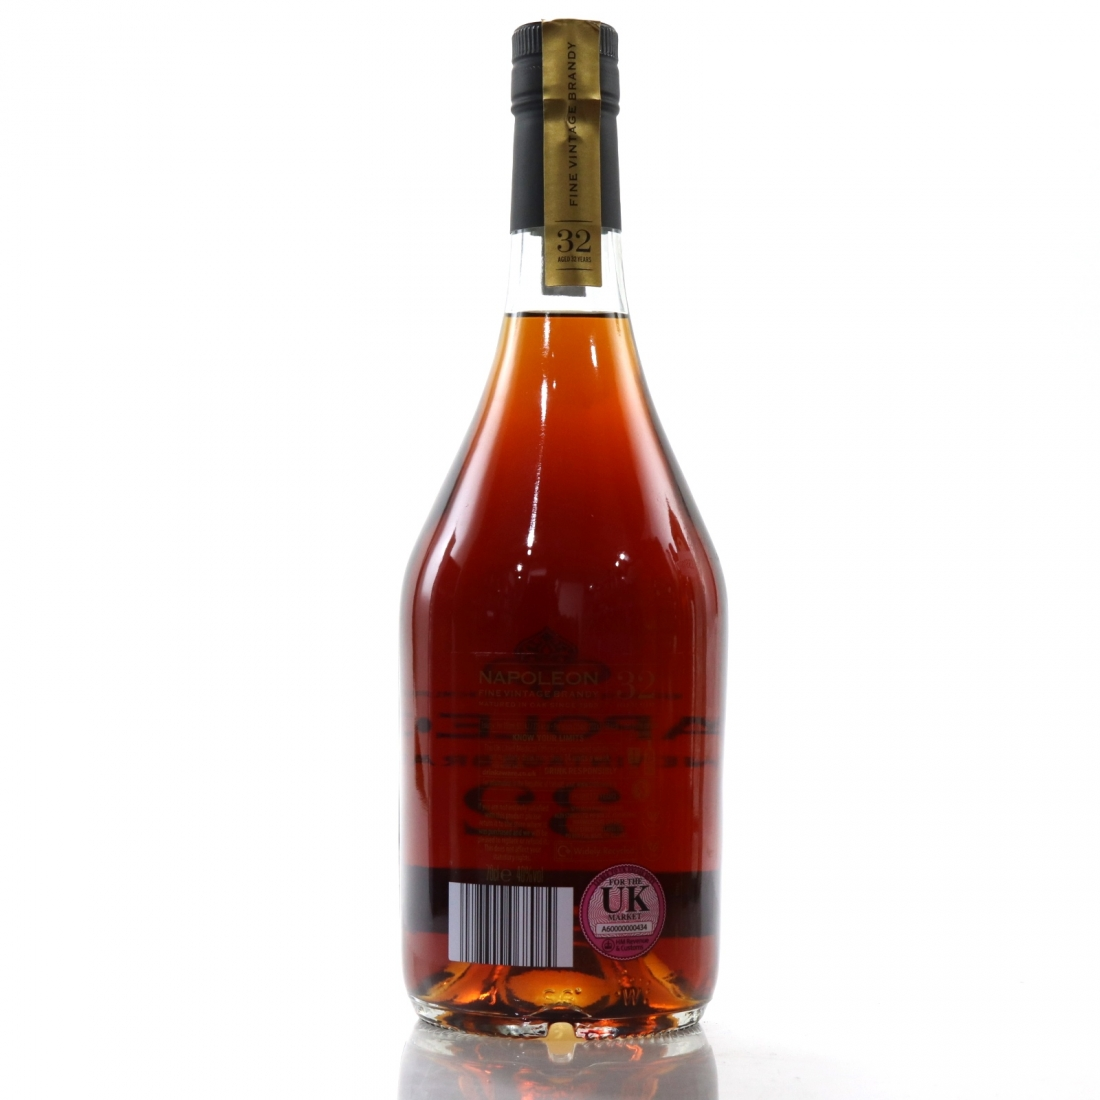 Napoleon 1985 32 Year Old Fine Vintage Brandy